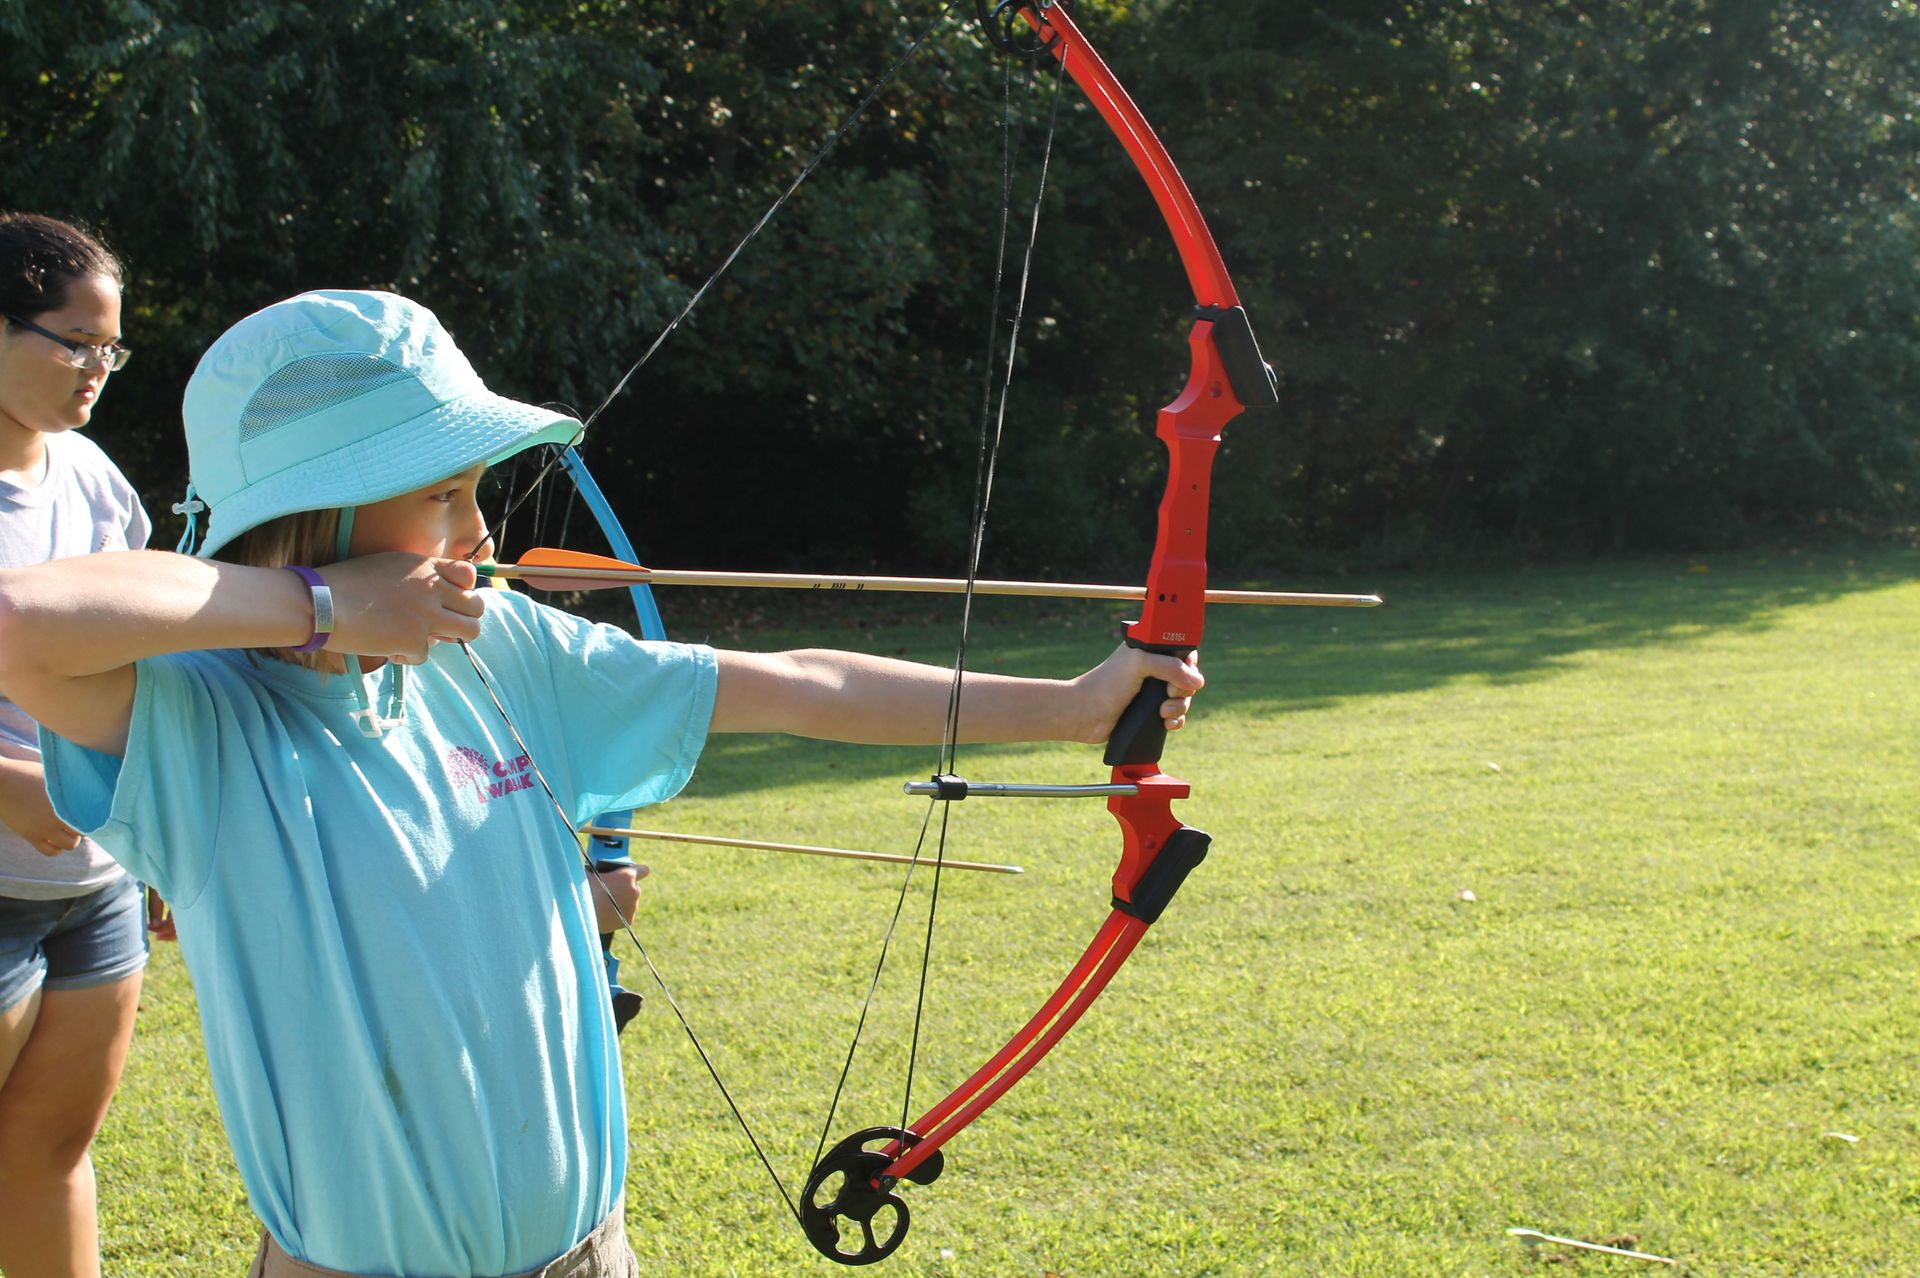 Students learning new skills at Hunting and Fishing Day